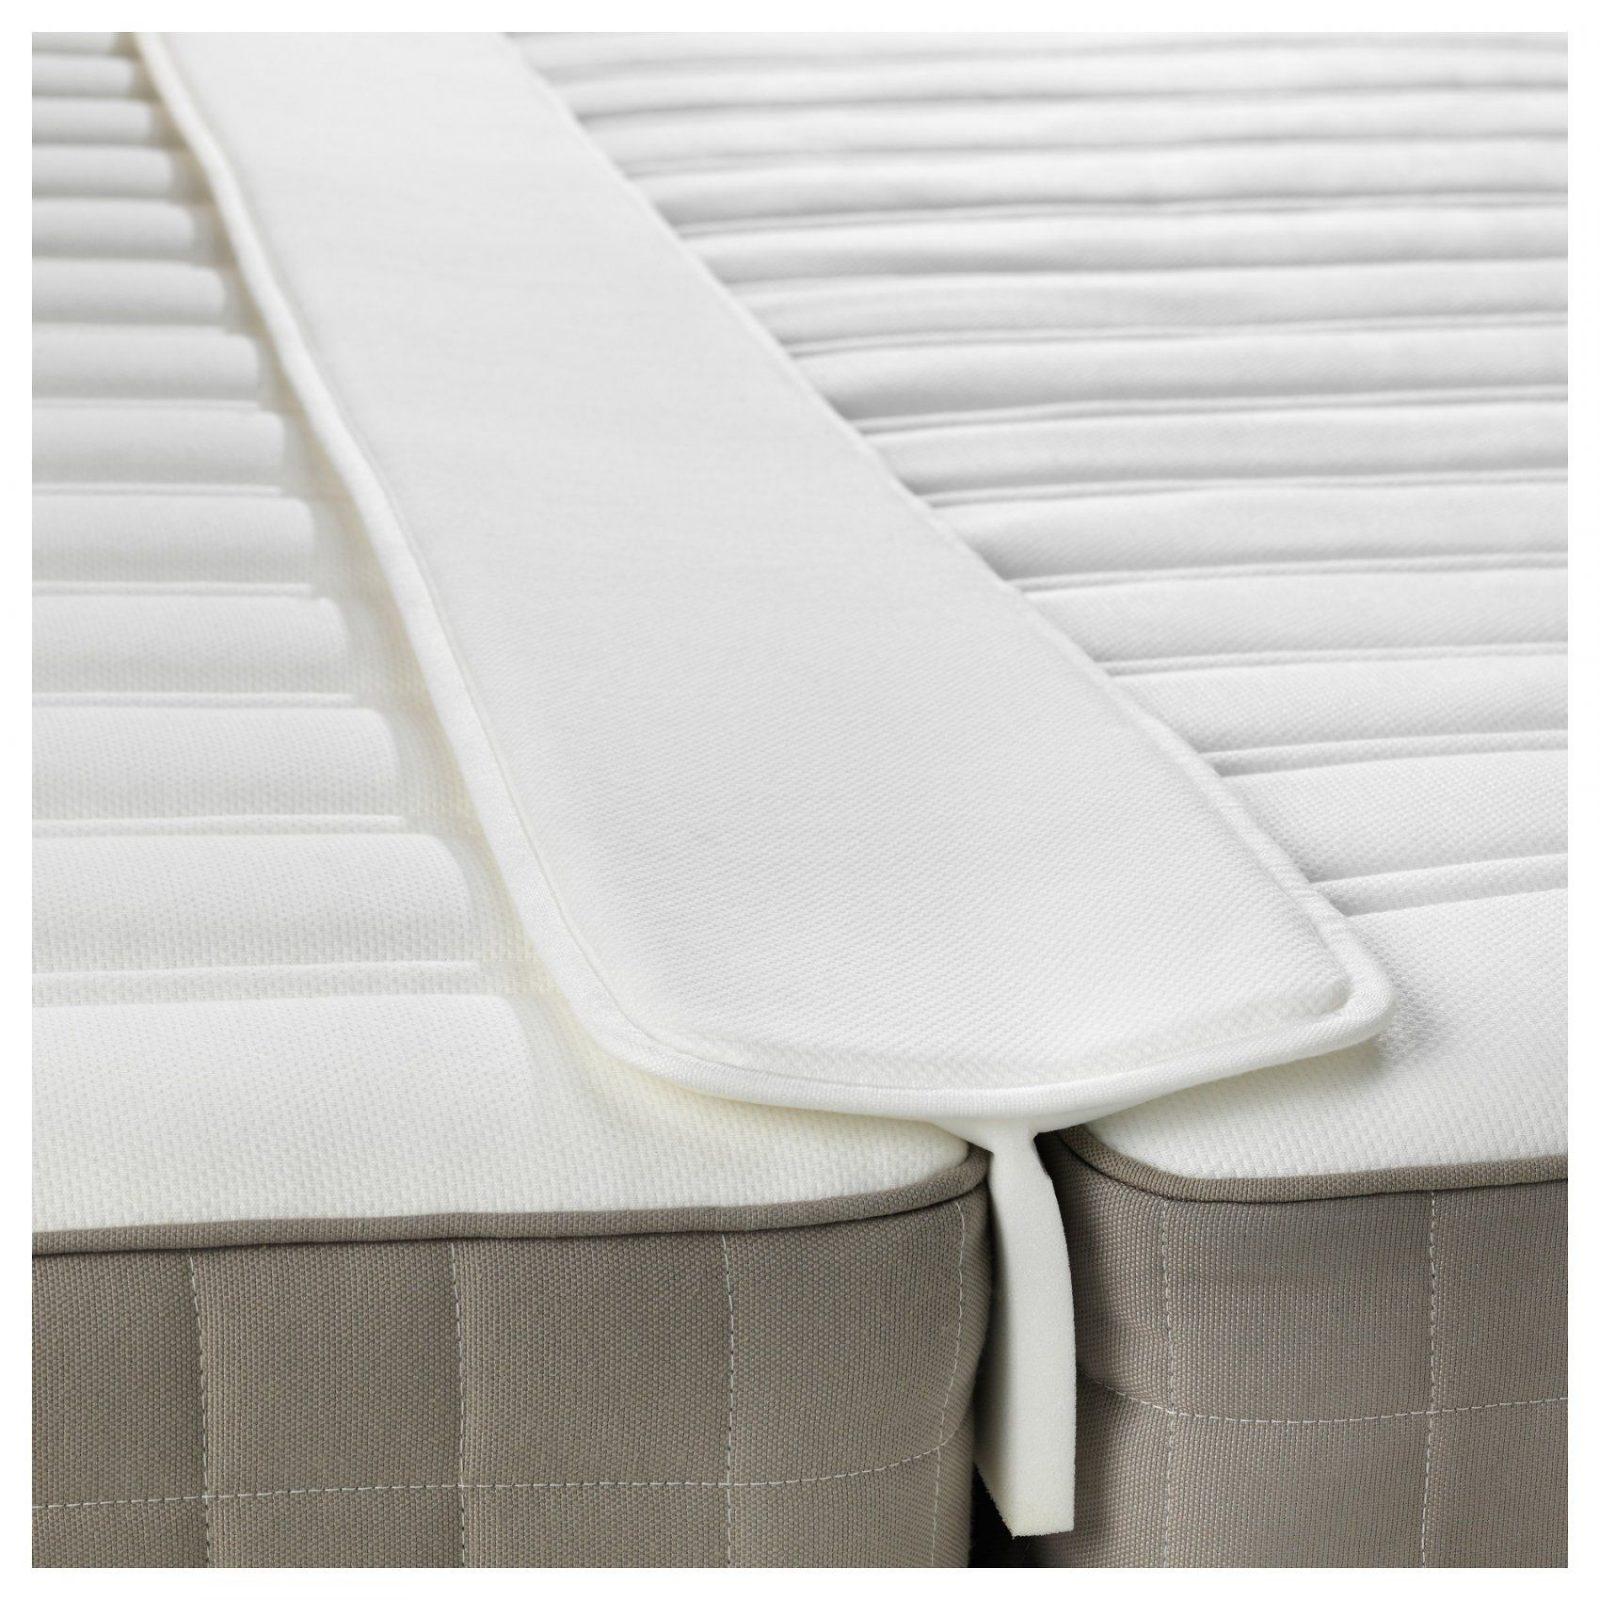 Ikea Matratzen Rückgabe Superb Bild Bezieht Sich Auf Ikea Matratzen von Matratzenkeil Dänisches Bettenlager Bild